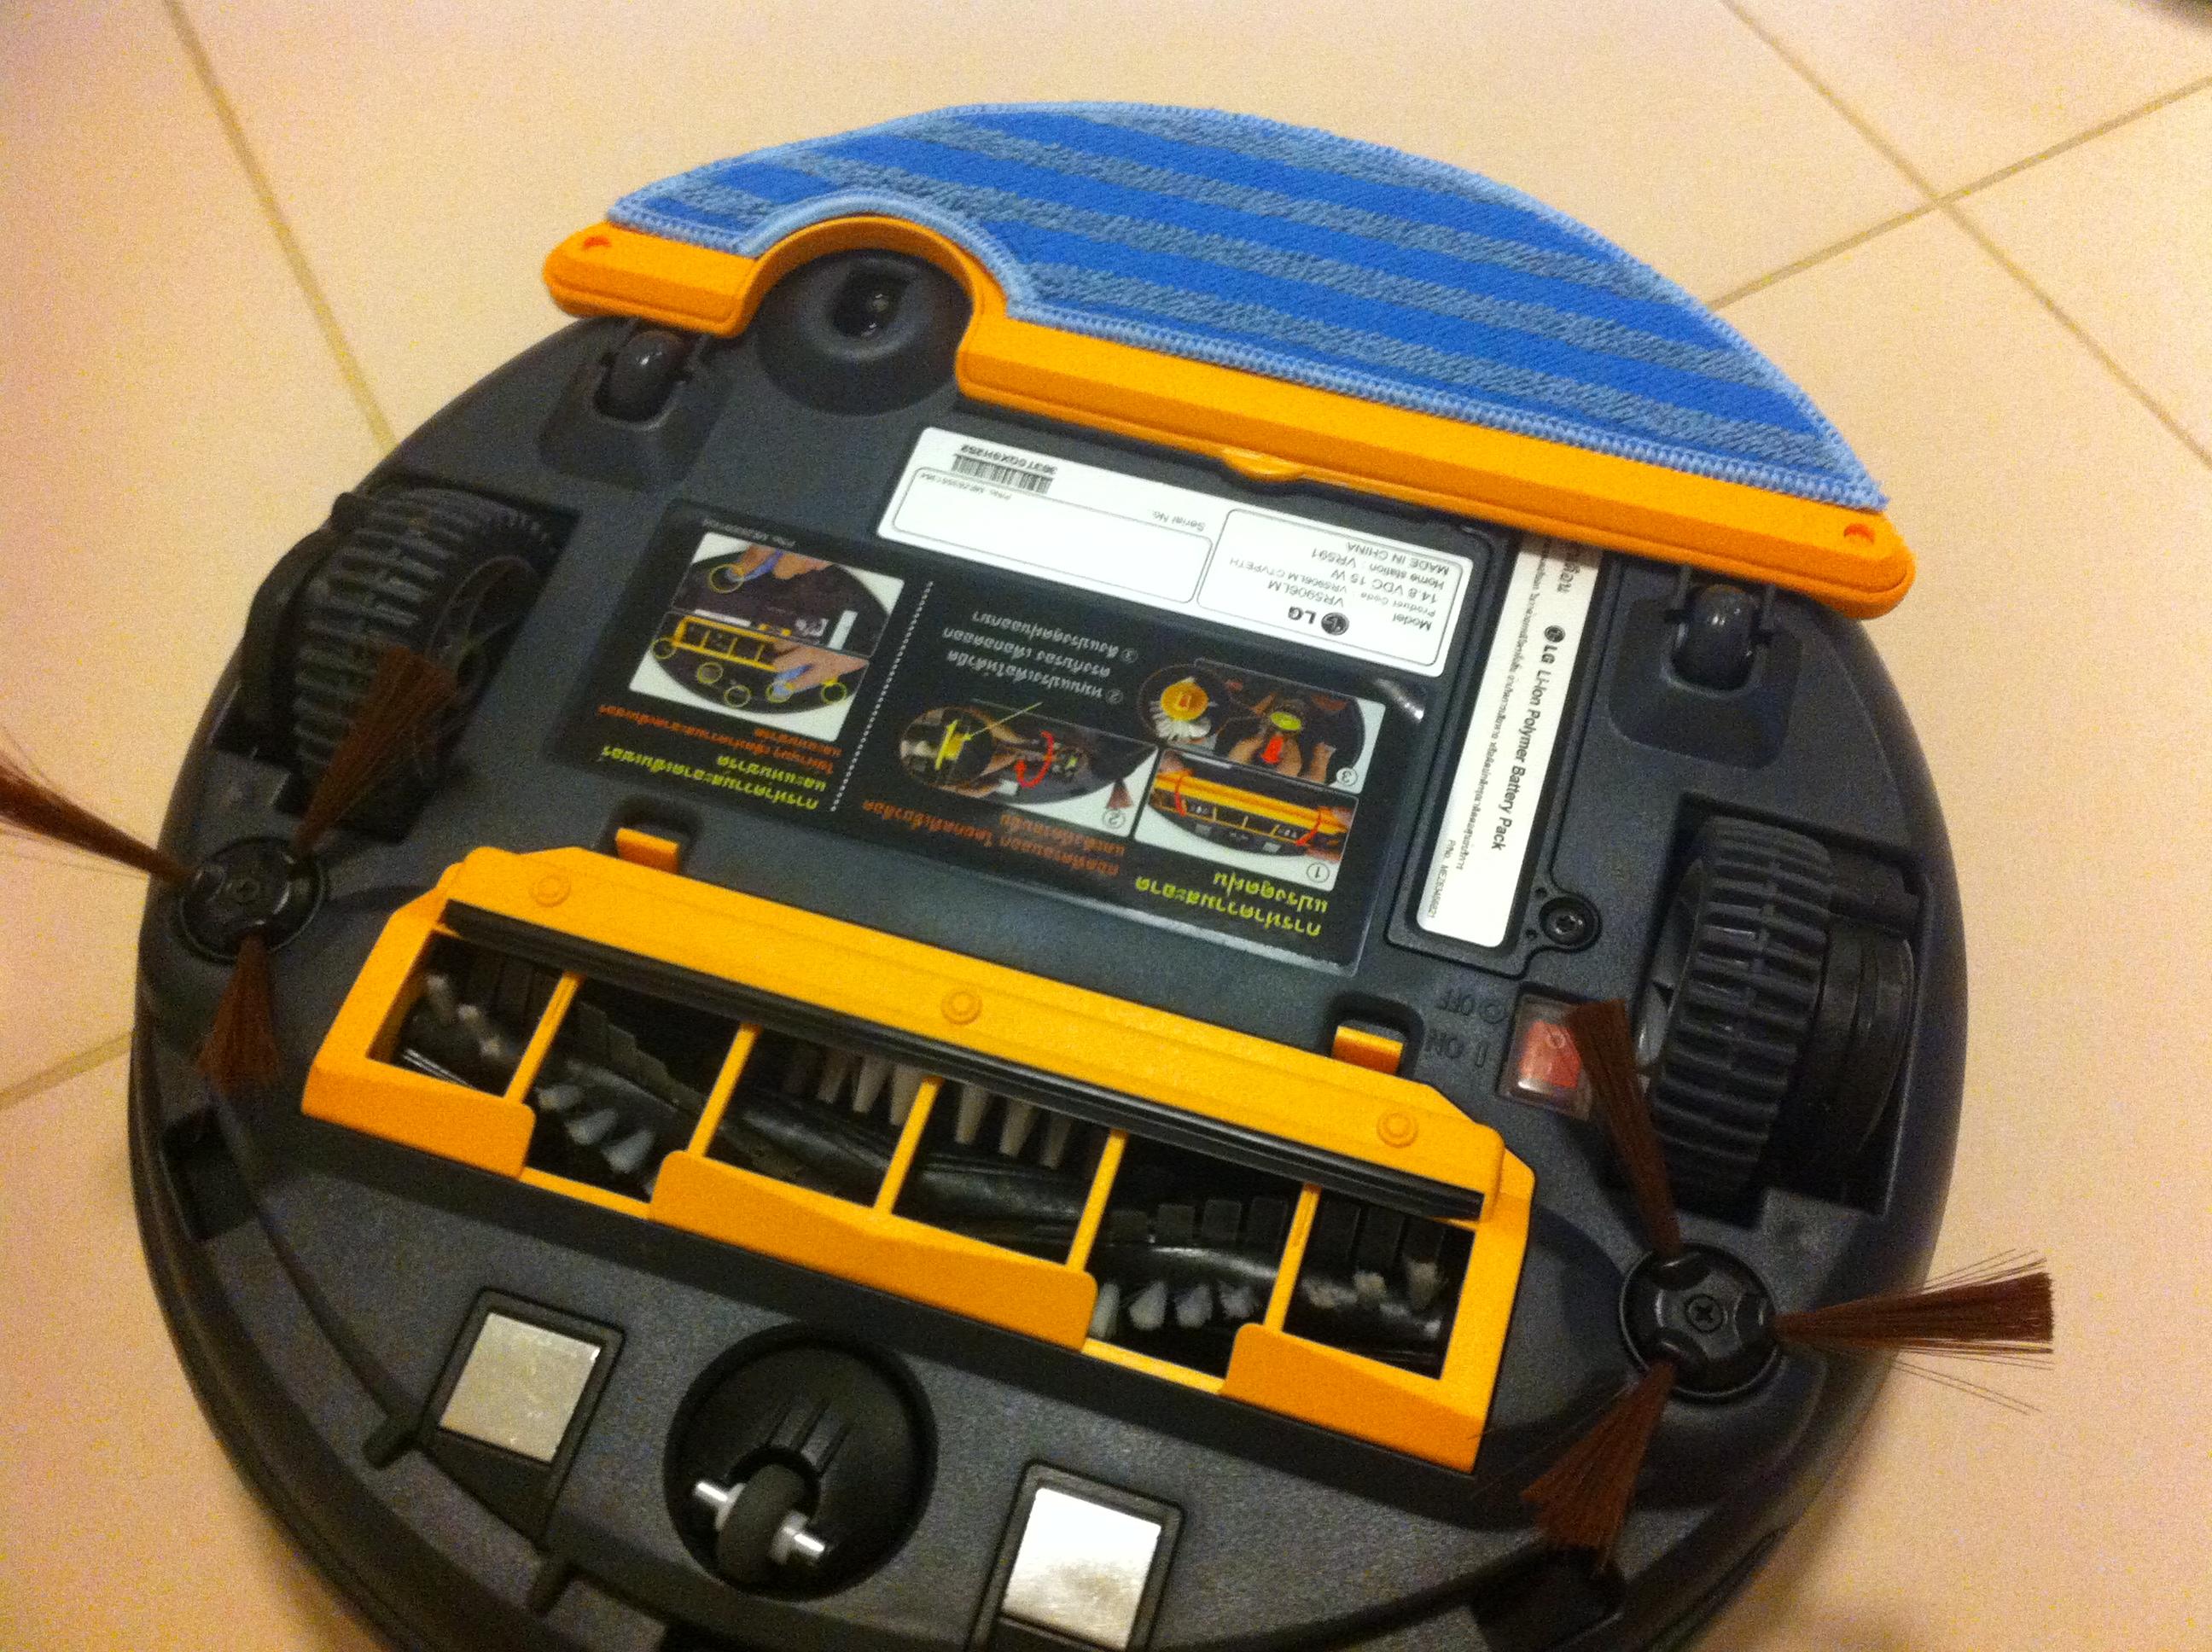 LG HOM-BOT-หุ่นยนต์ดูดฝุ่น-9